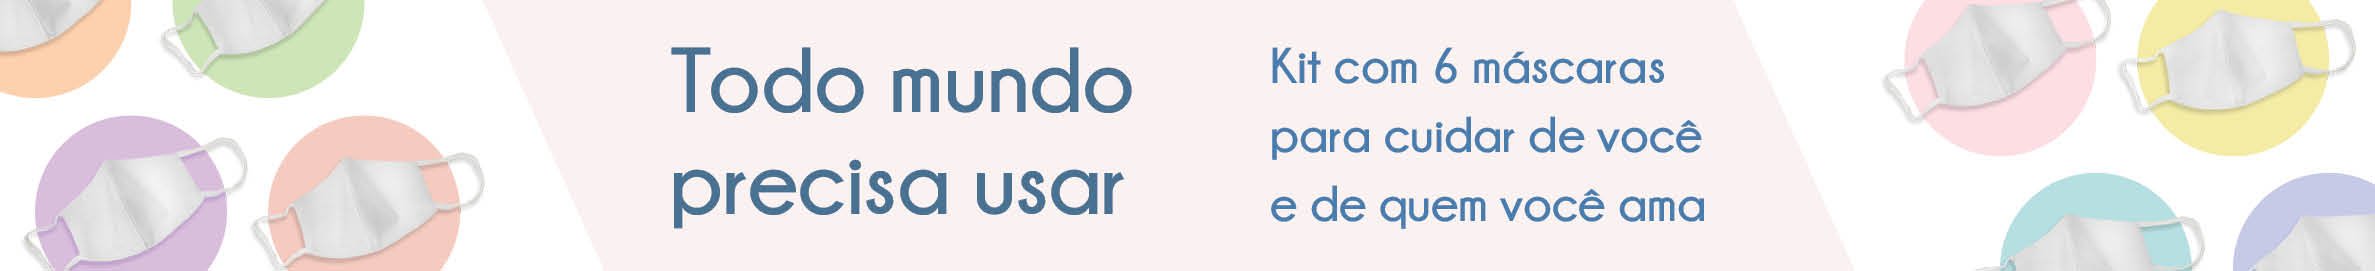 #Kit de Máscaras